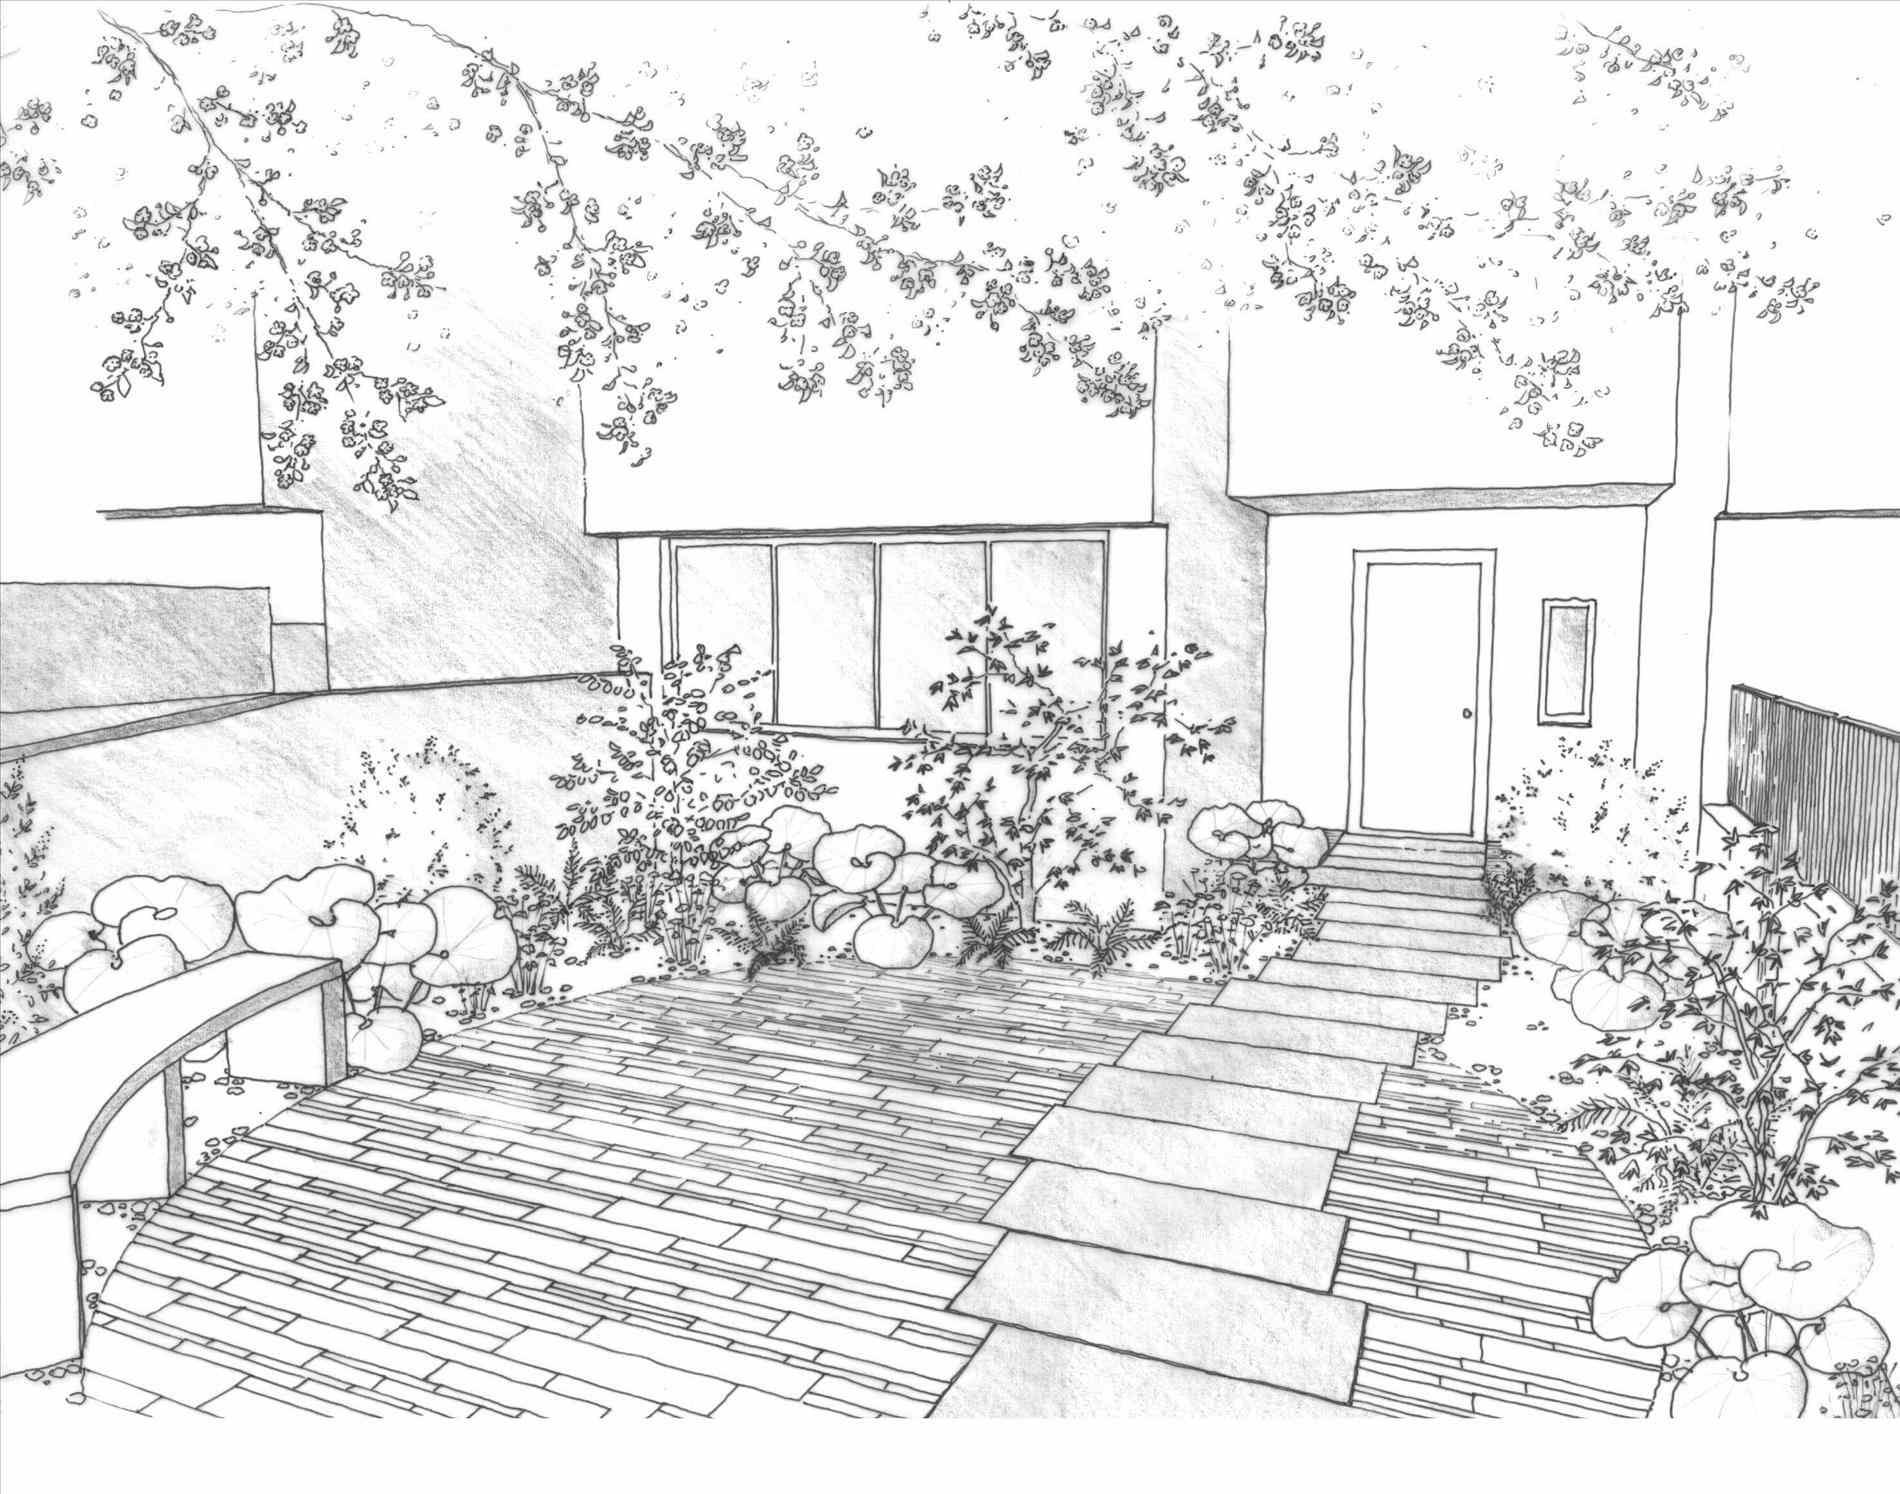 1900x1494 Landscape Drawings Pencil For Kids Articlespagemachinecom